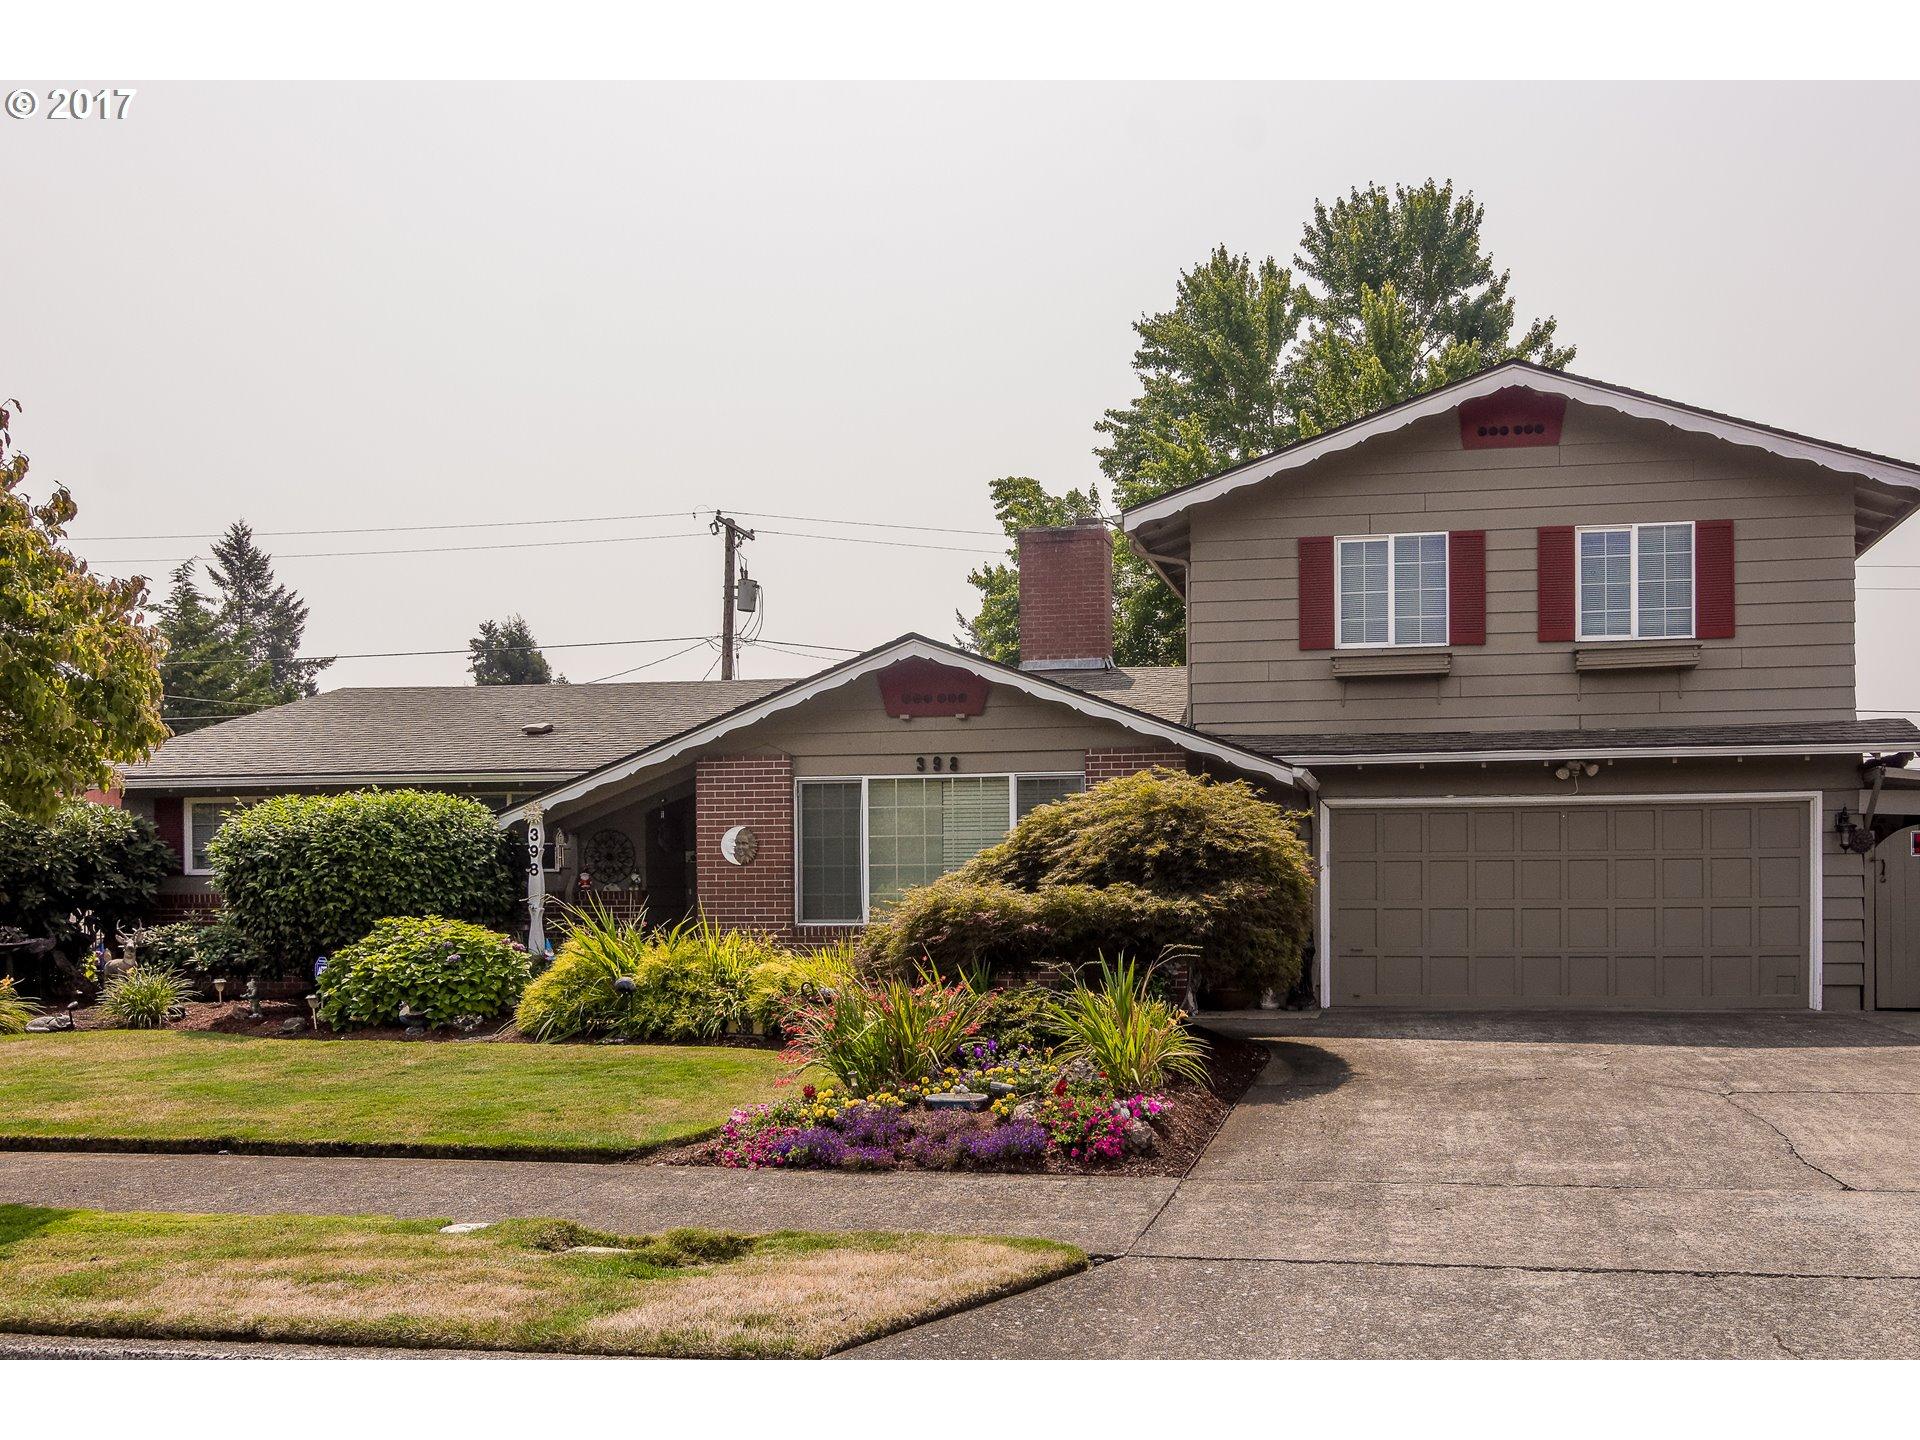 398 SANTA CLARA AVE, Eugene, OR 97404